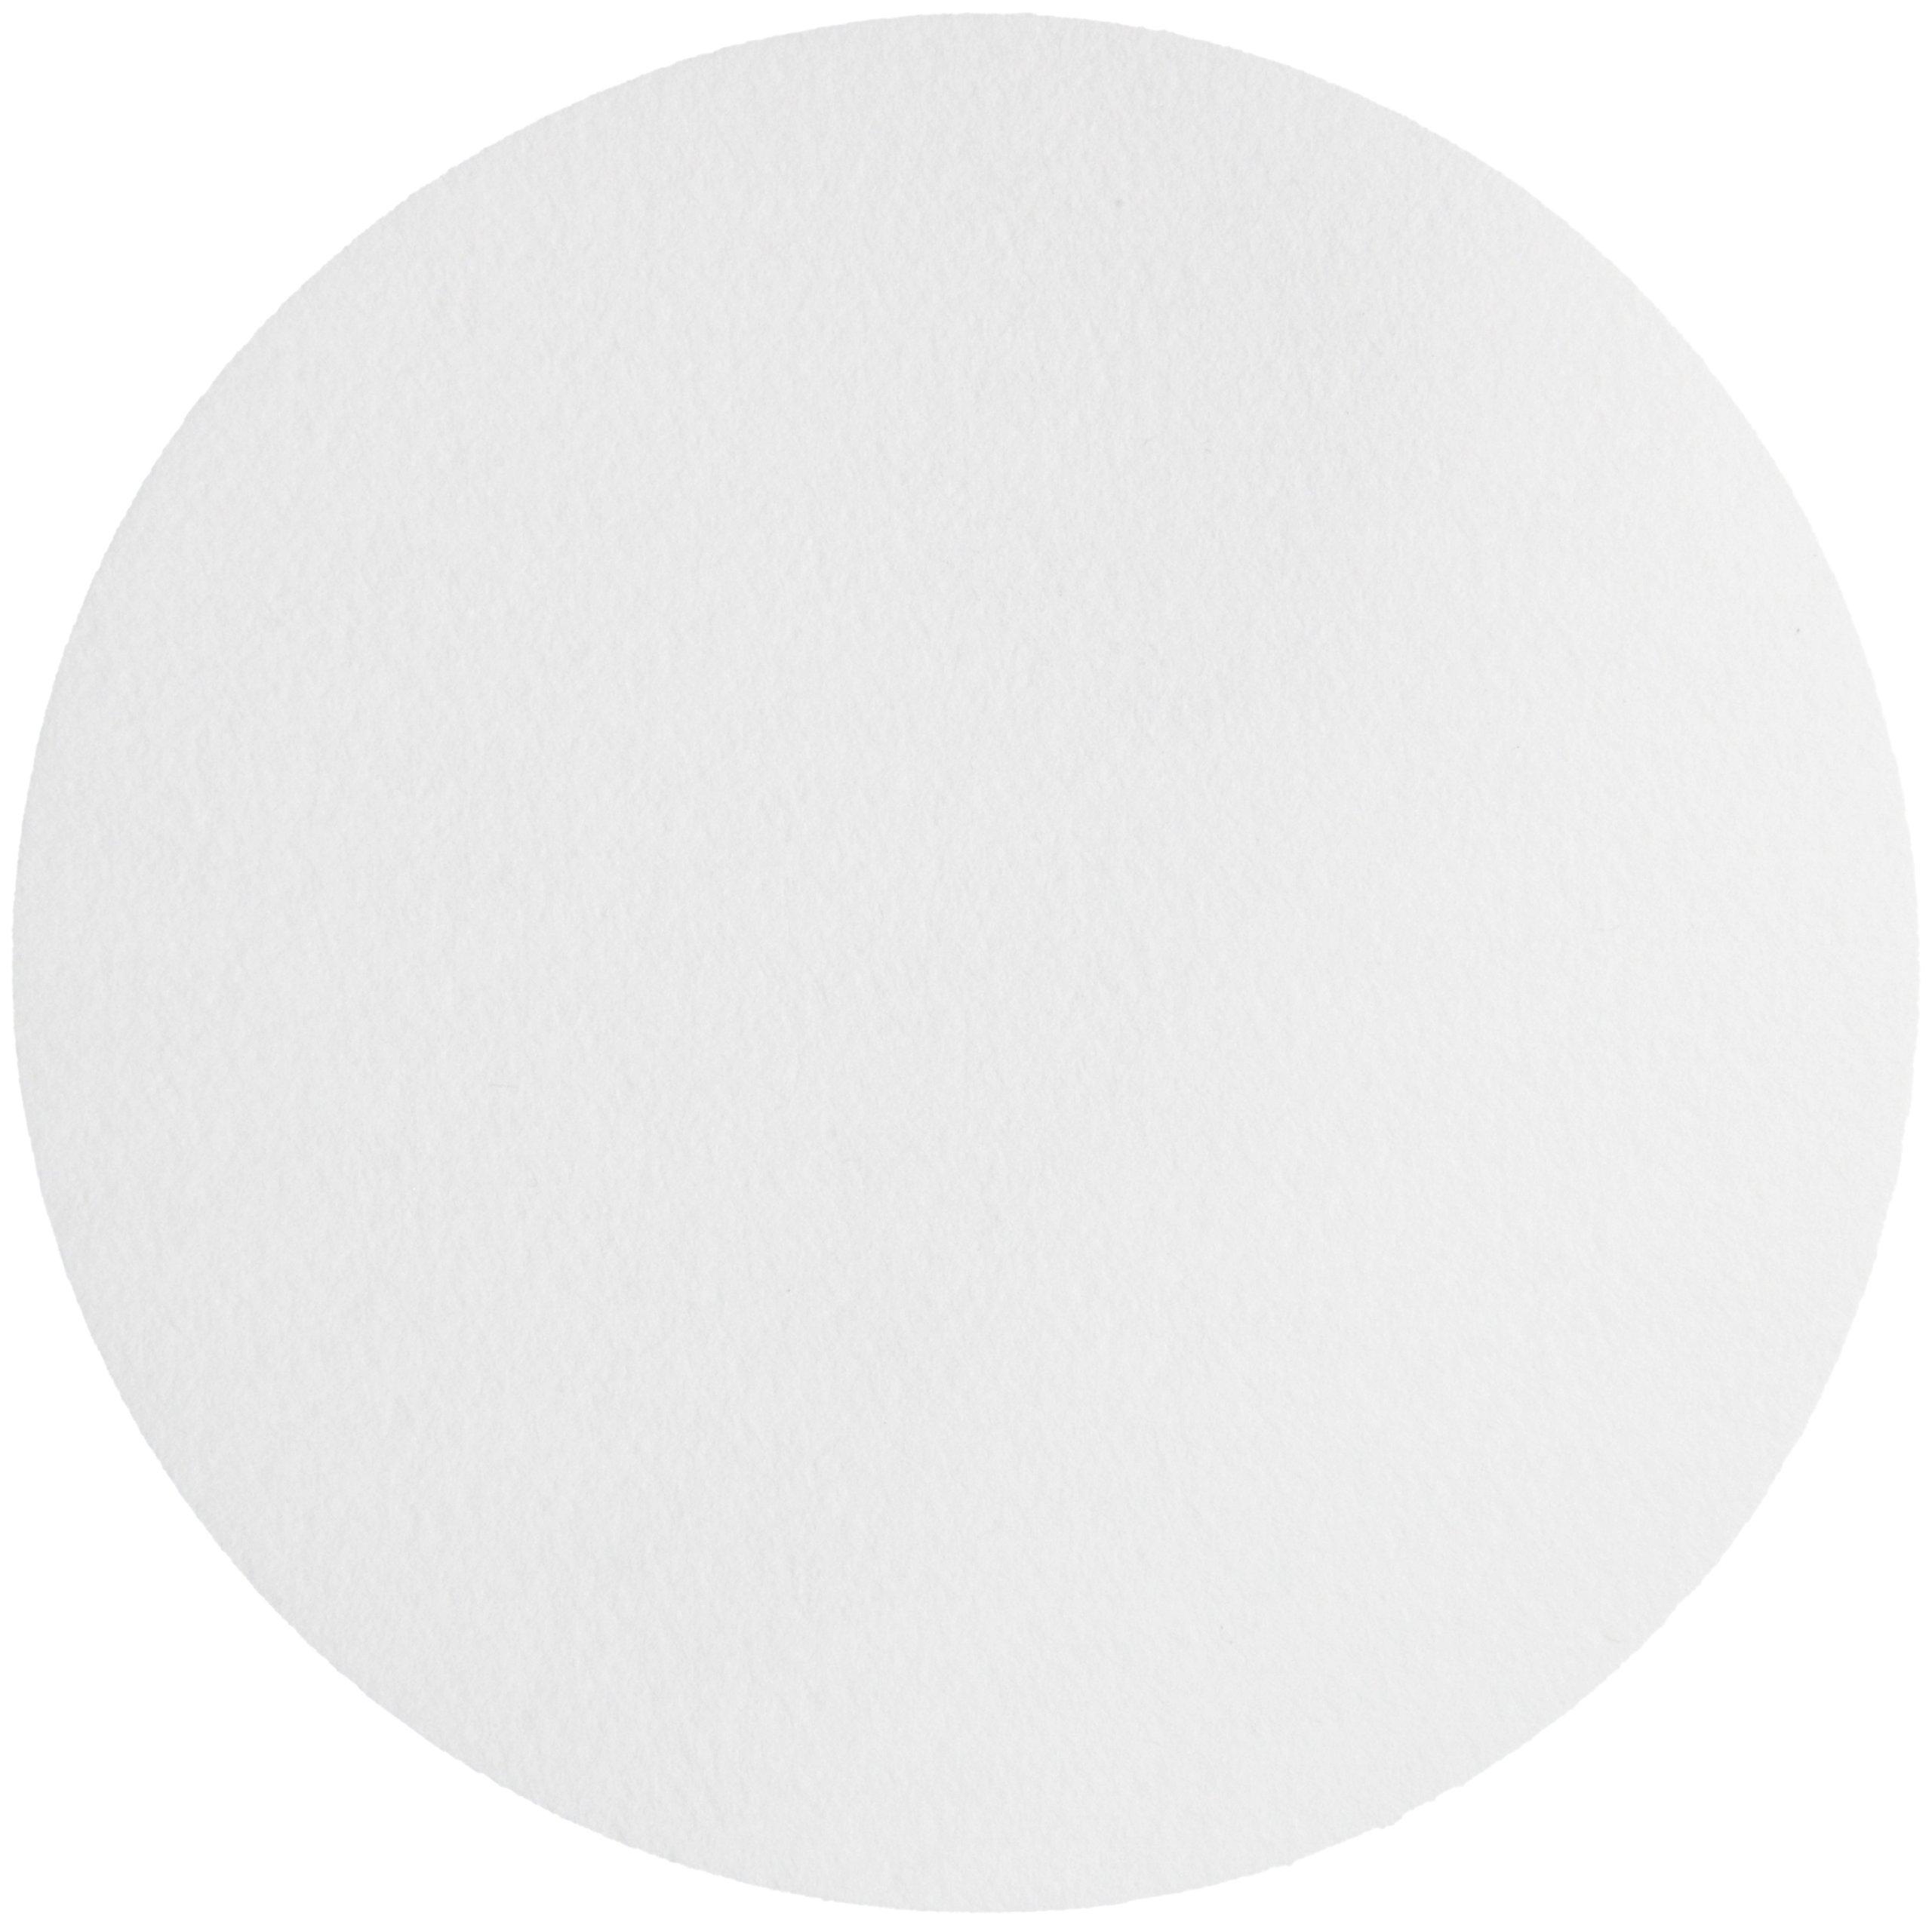 Whatman 1005-110 Quantitative Filter Paper Circles, 2.5 Micron, 94 s/100mL/sq inch Flow Rate, Grade 5, 110mm Diameter (Pack of 100)